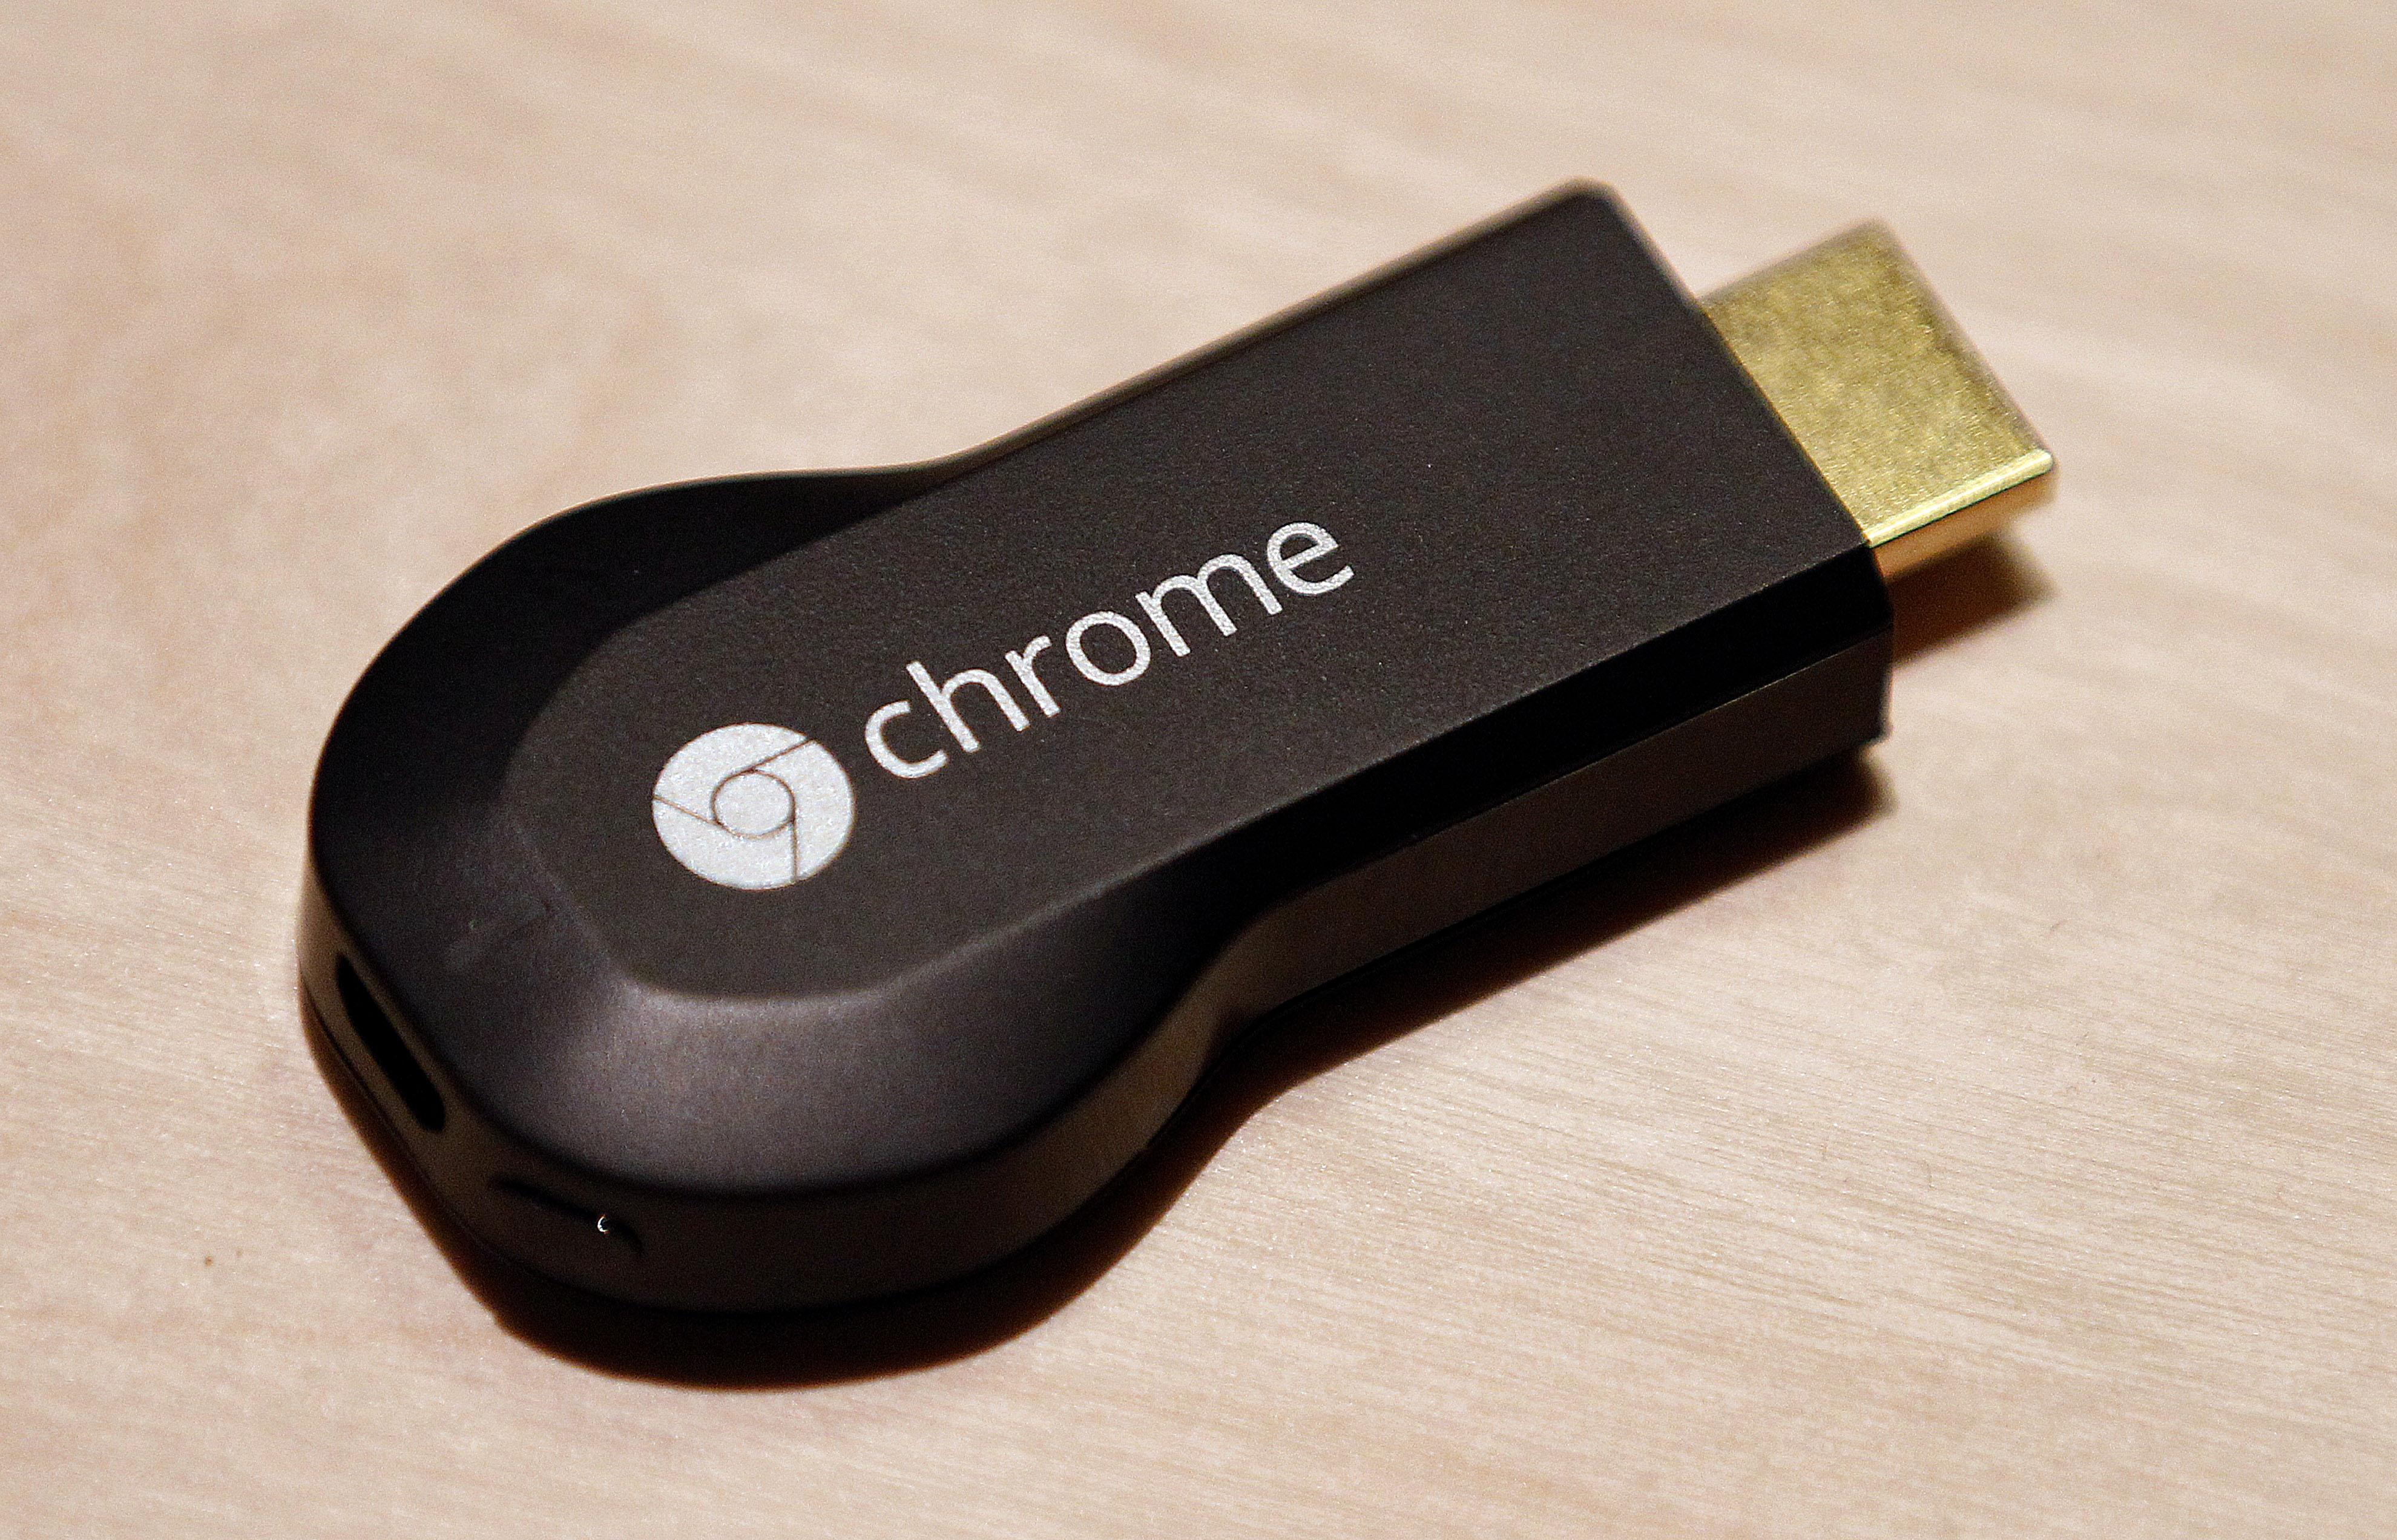 Google's Chromecast